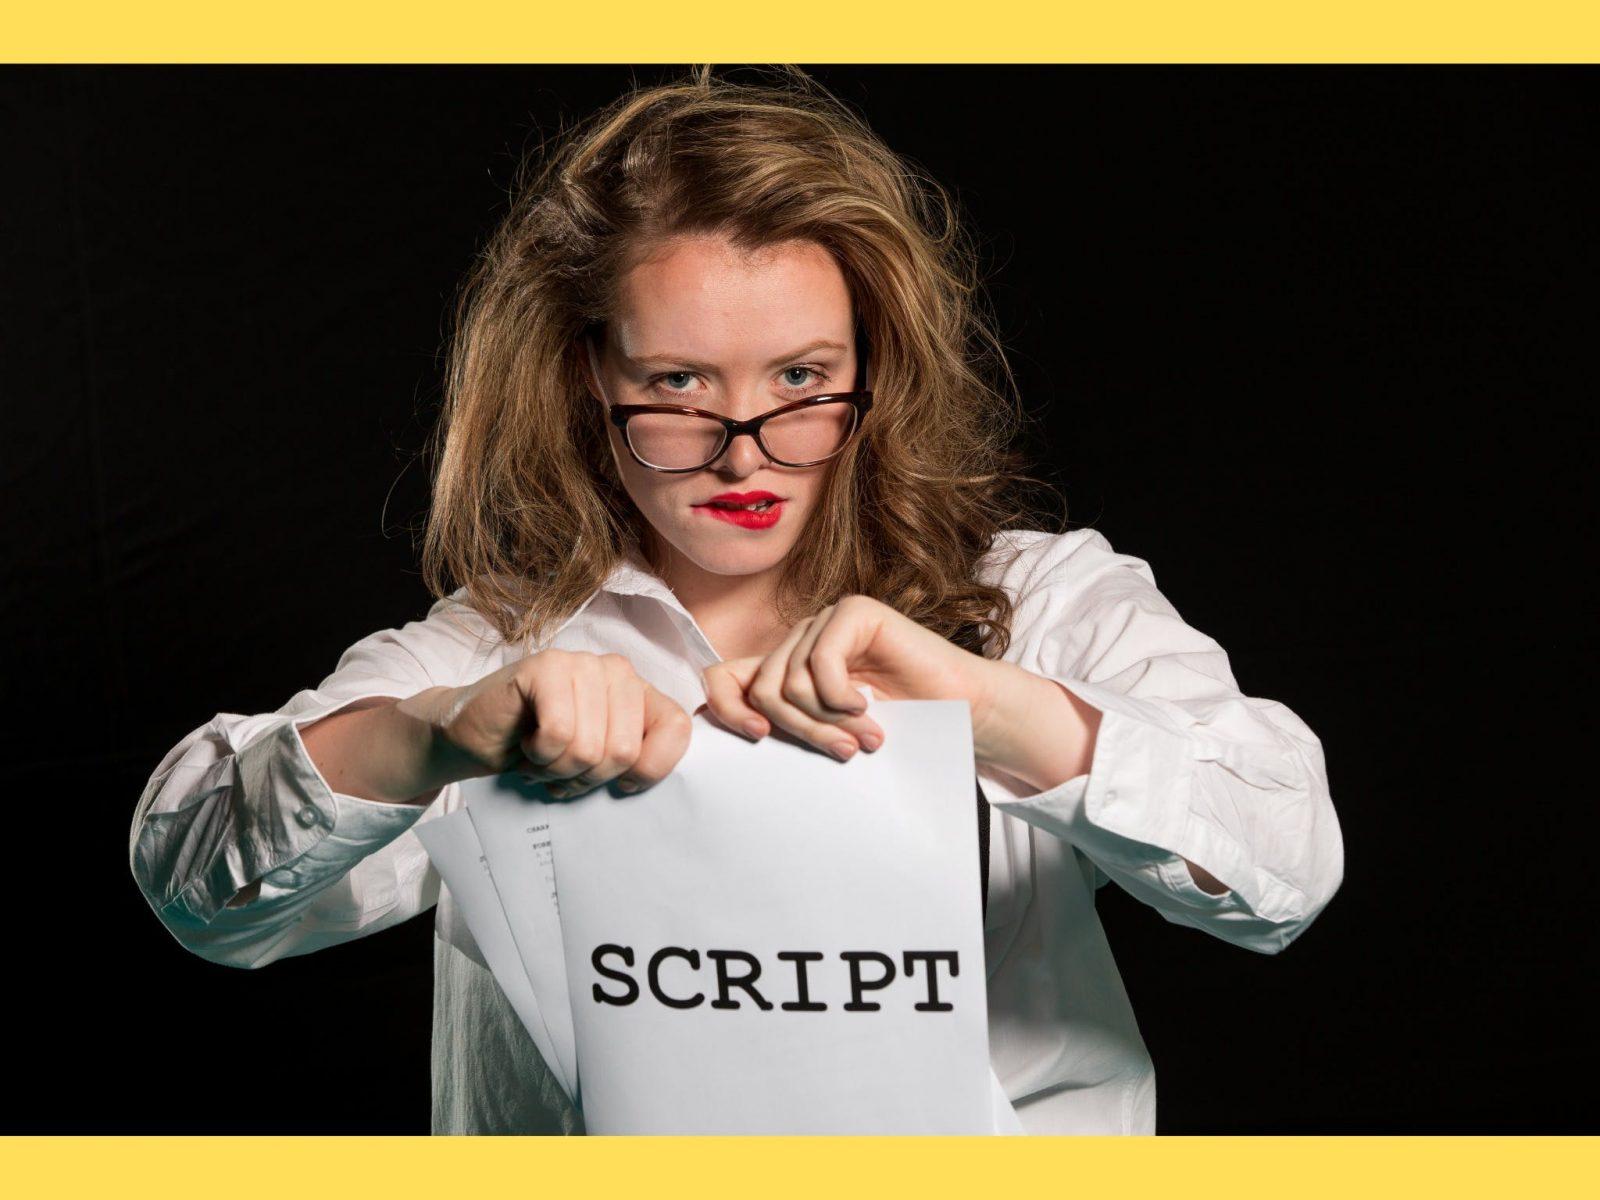 Woman tearing up a script